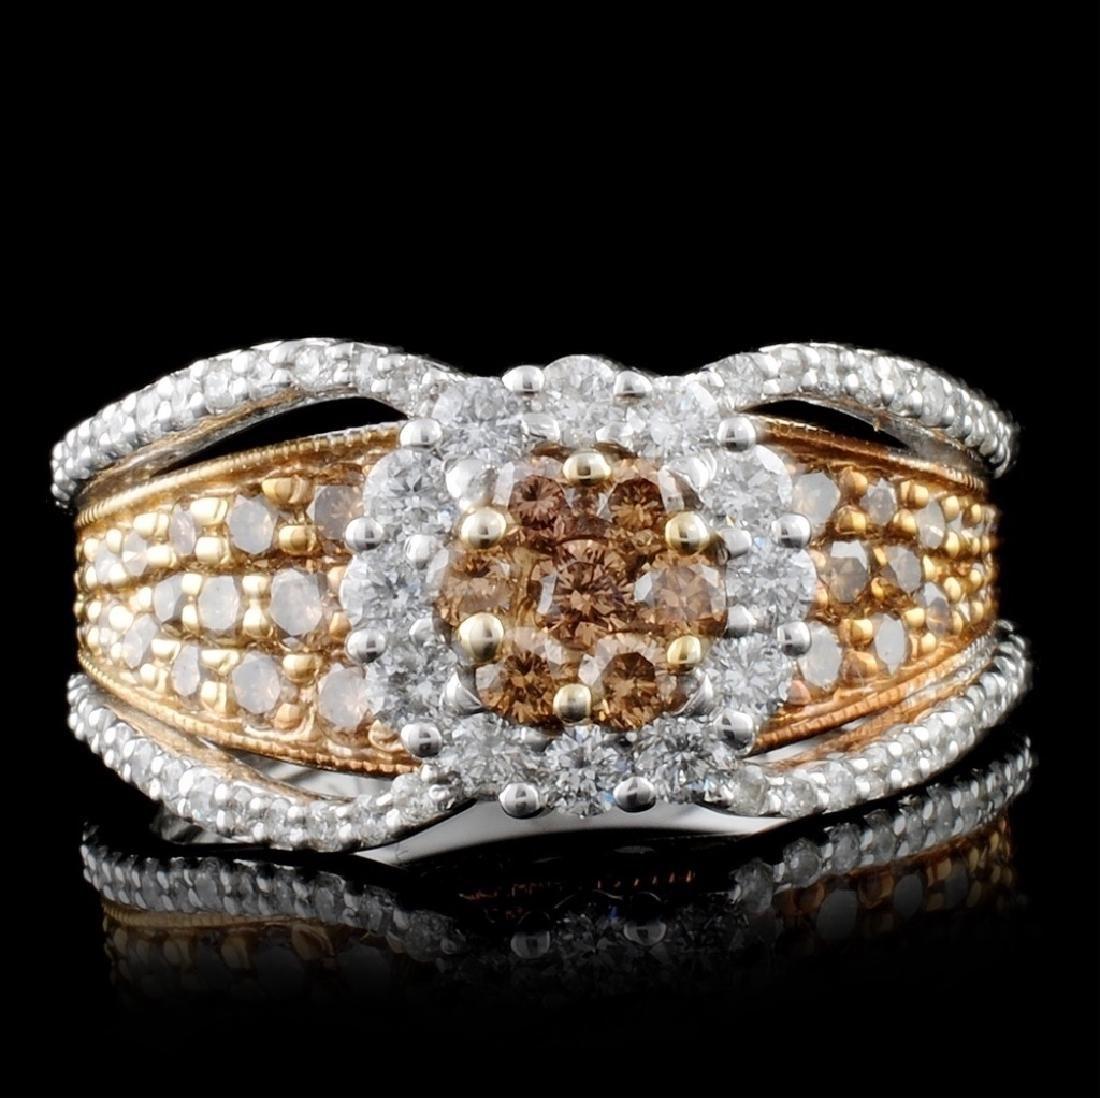 14K White Gold 2.82ctw Fancy Color Diamond Ring